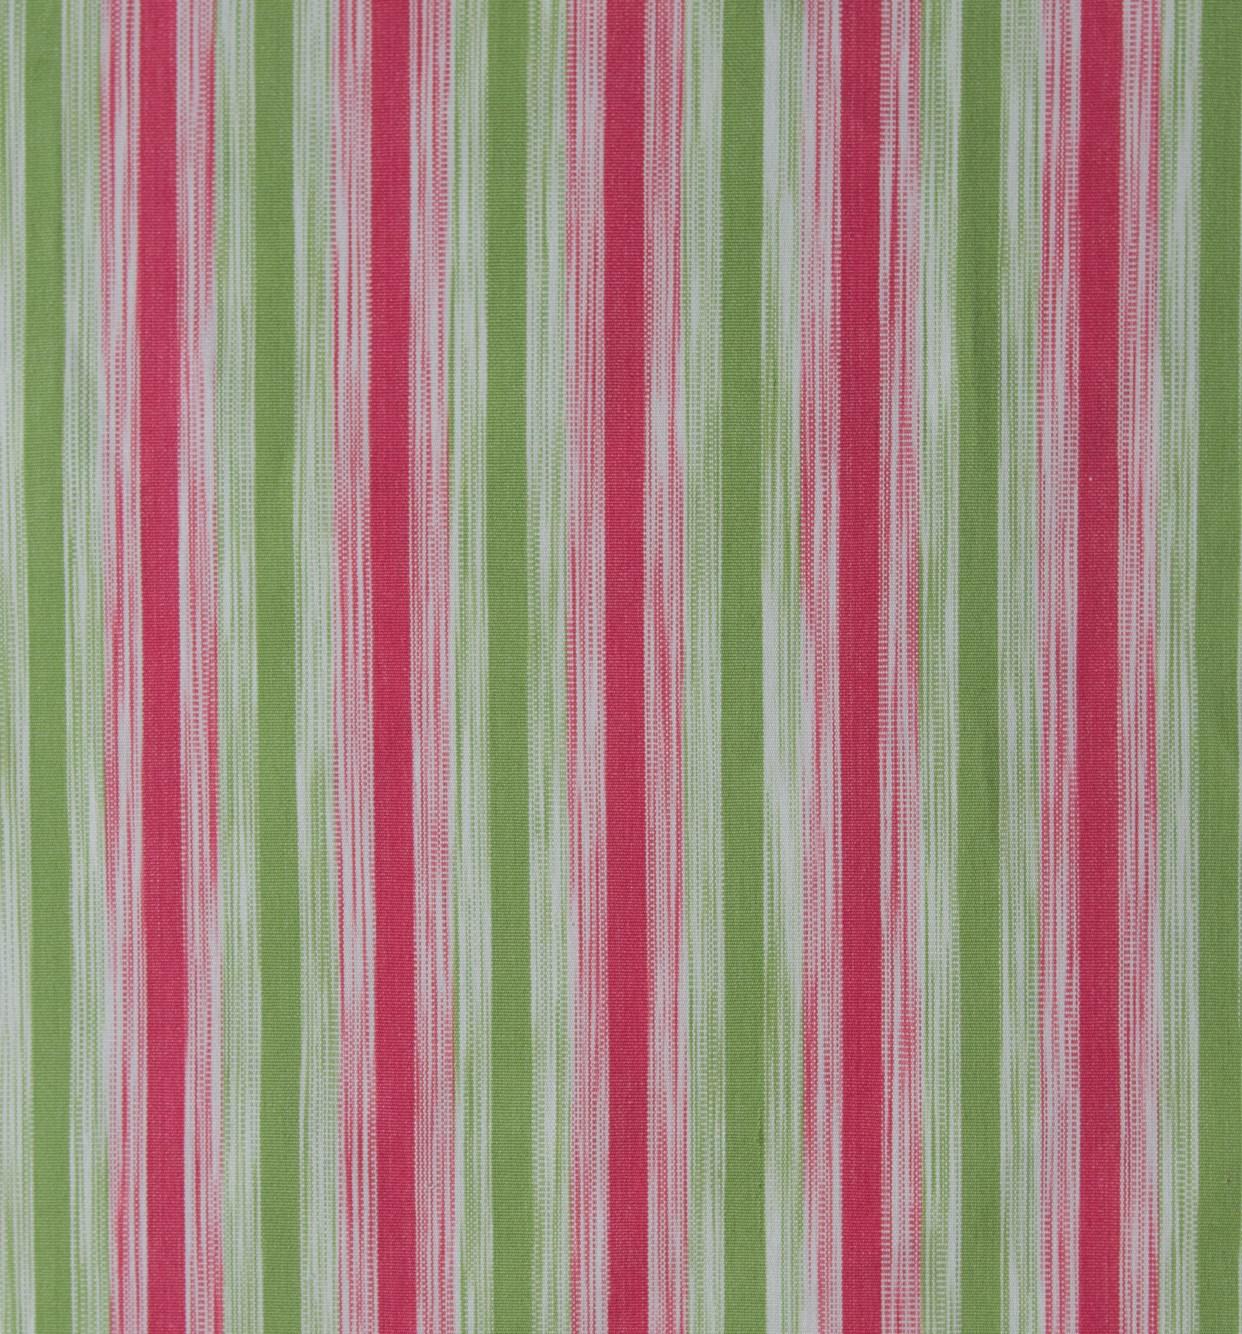 Strie Stripe 02 Pink & Green